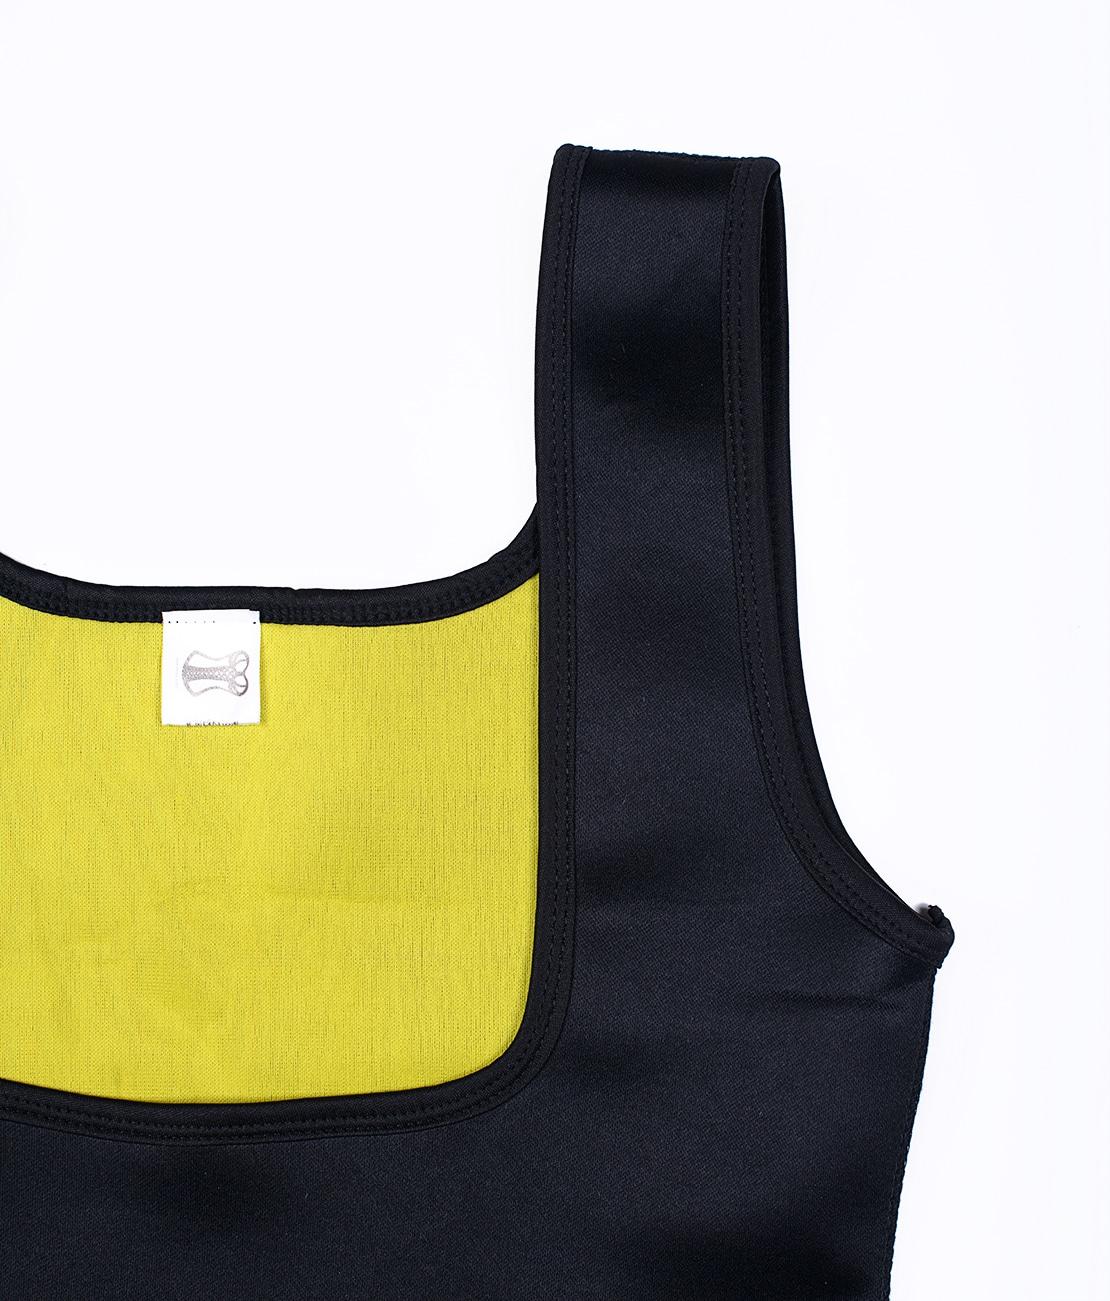 T-Shirt de sudation Noir Packshot Detail 3